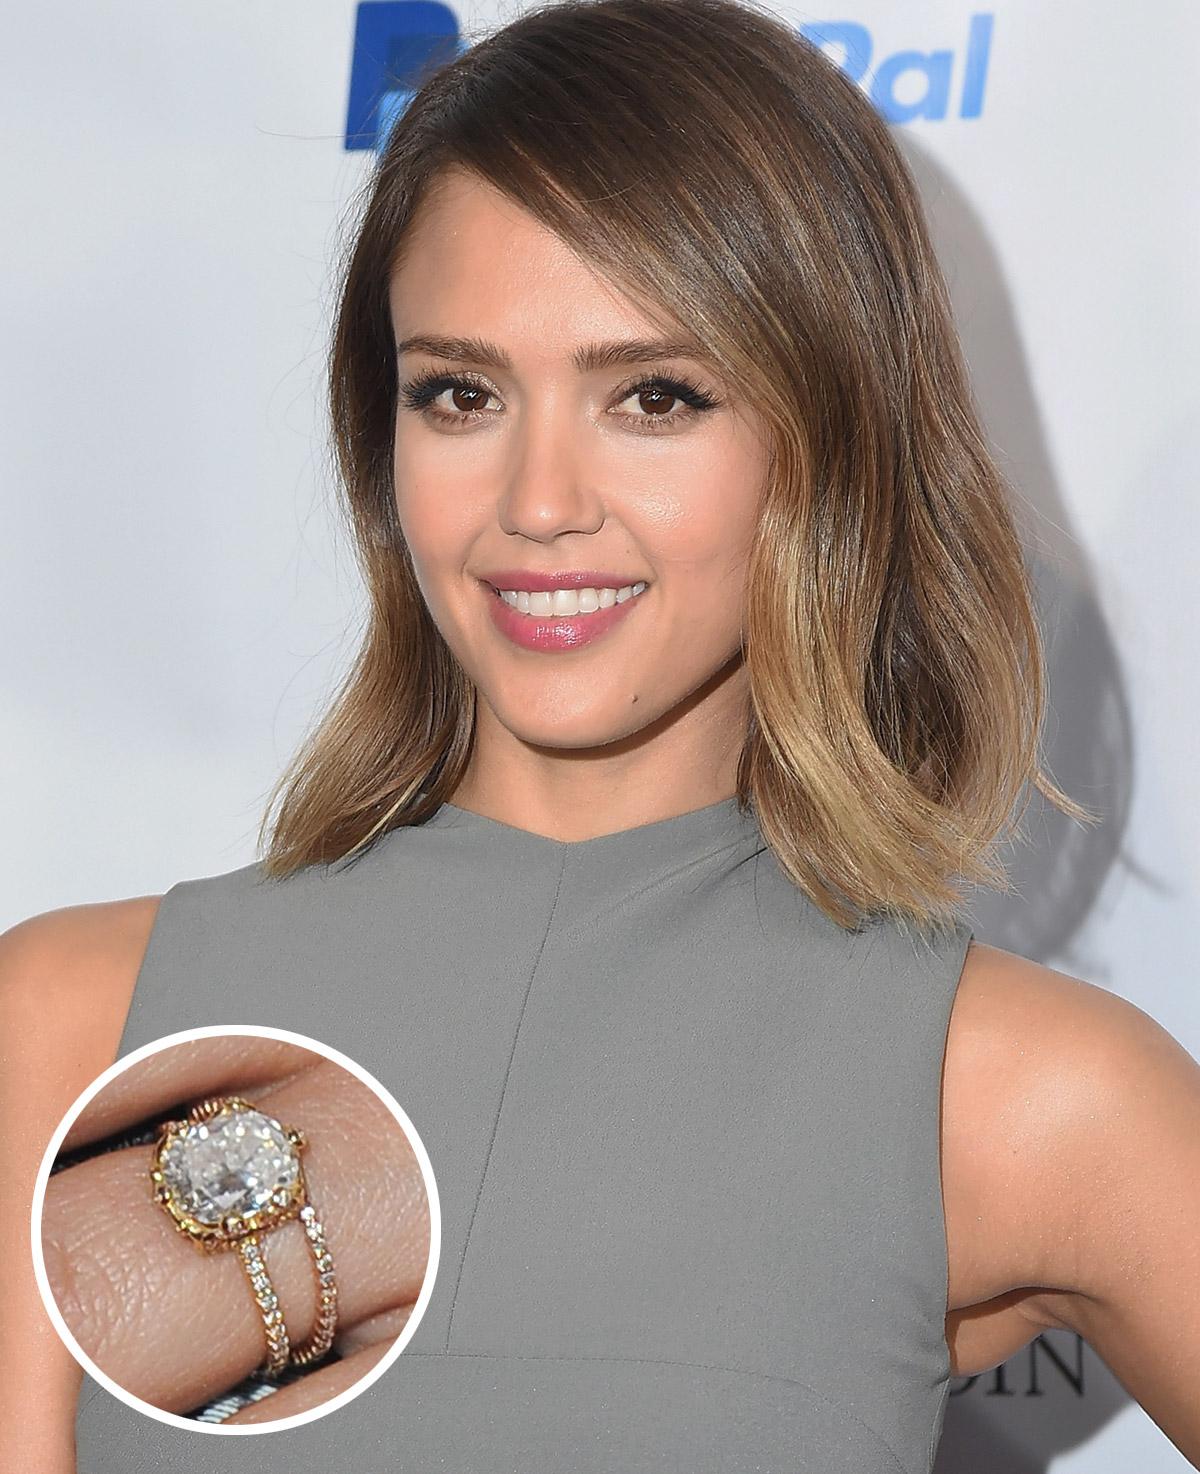 75 Best Celebrity Engagement Rings